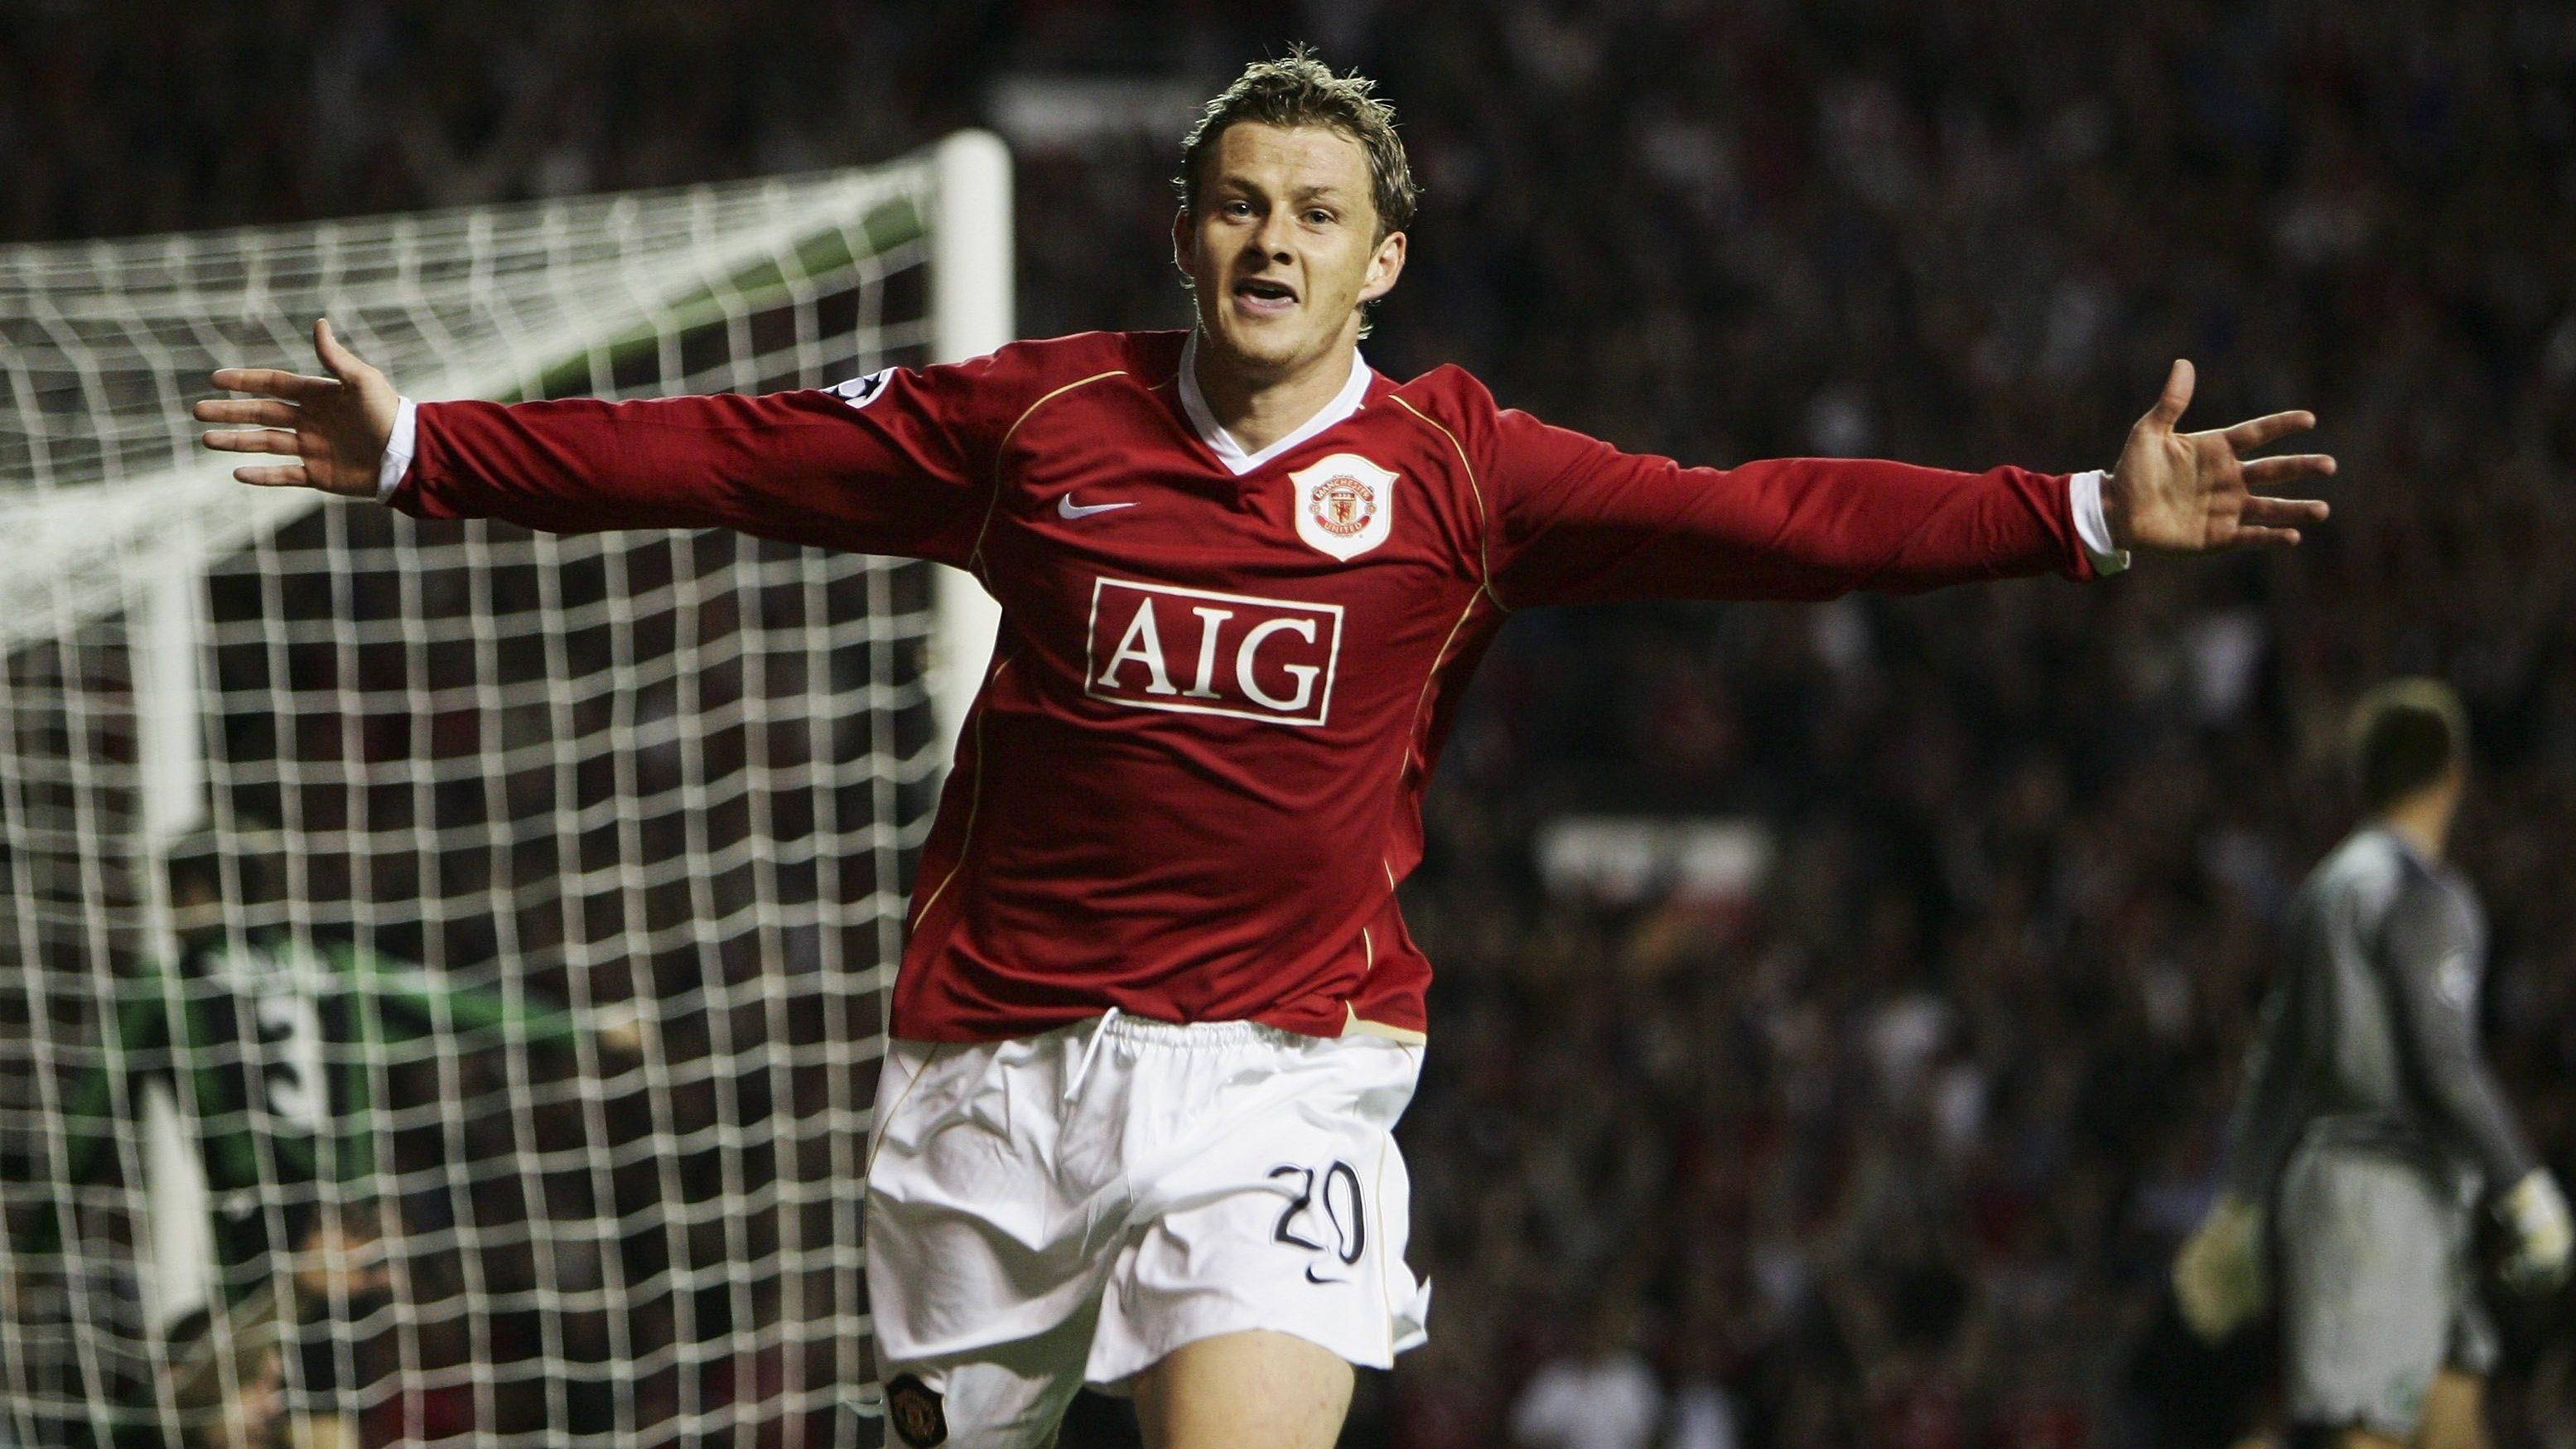 ae21e6977 Social media reacts to Ole Gunnar Solskaer s Manchester United return